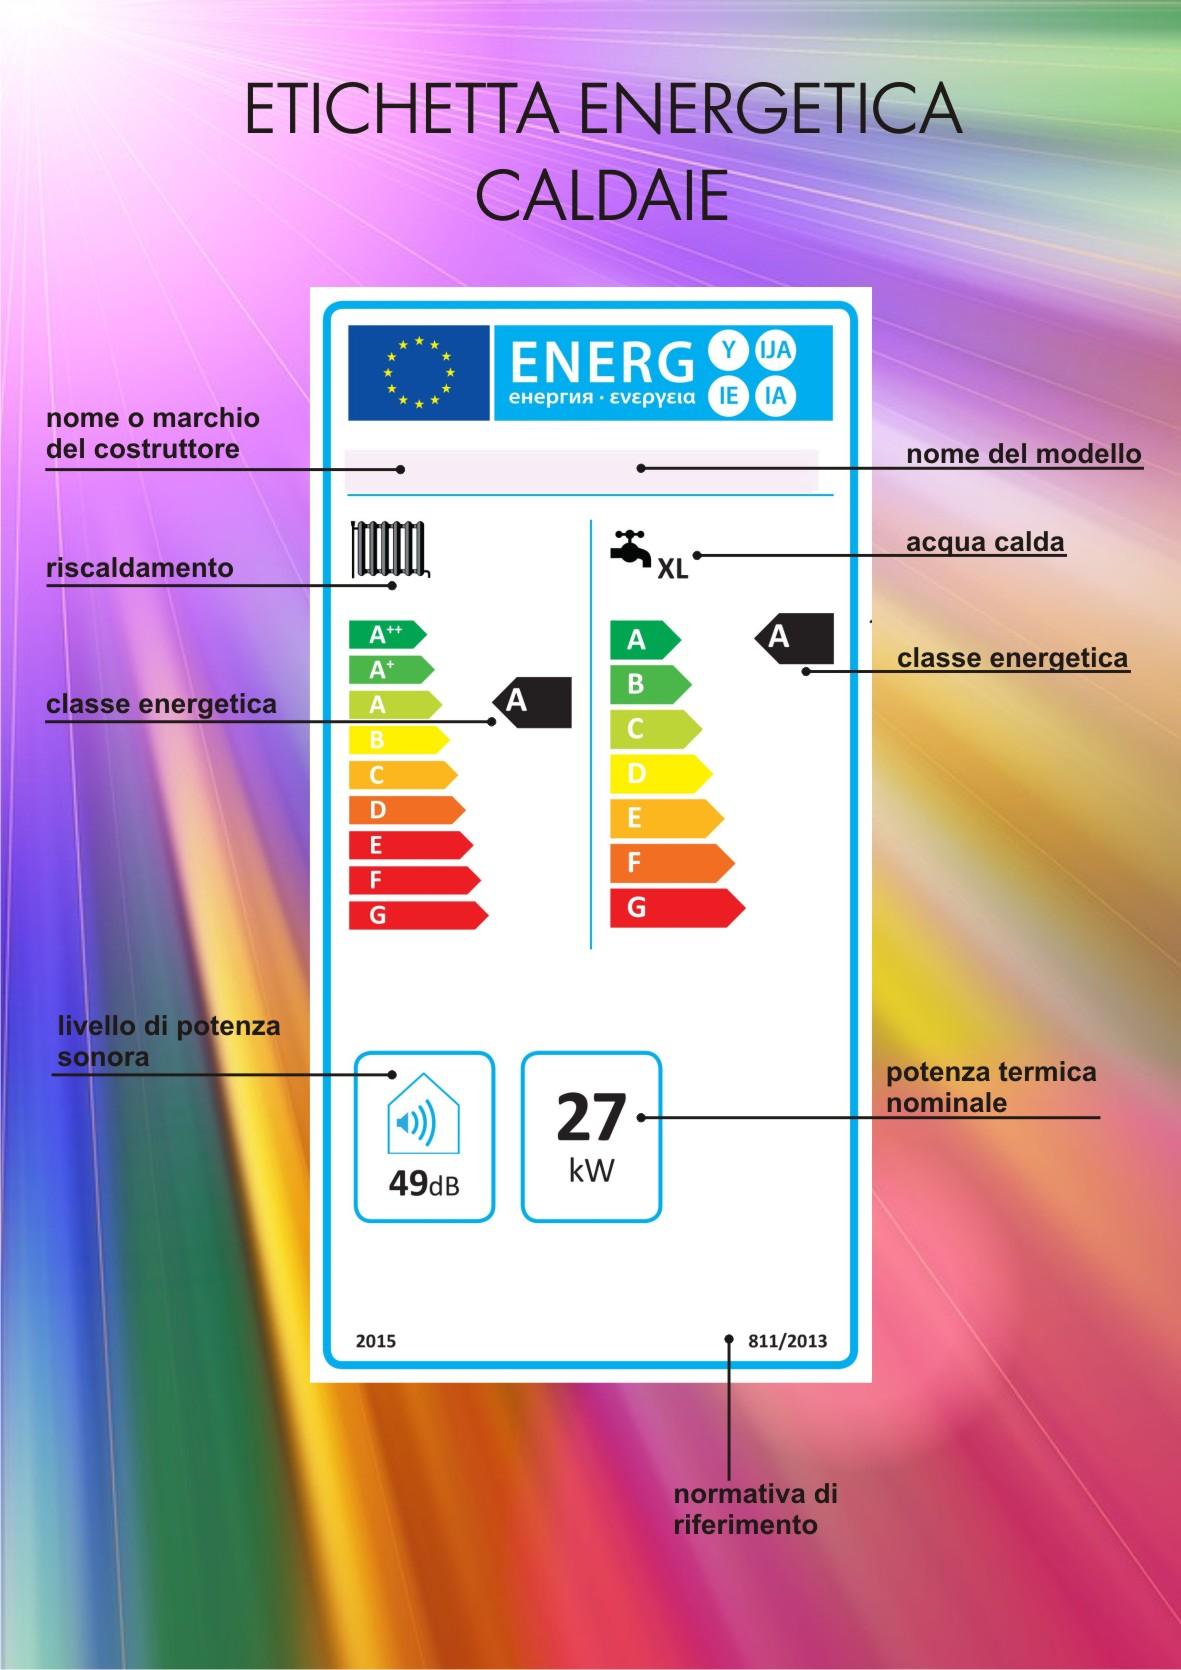 Svantaggi Caldaie A Condensazione caldaie e corpi scaldanti: interventi sul risparmio e l